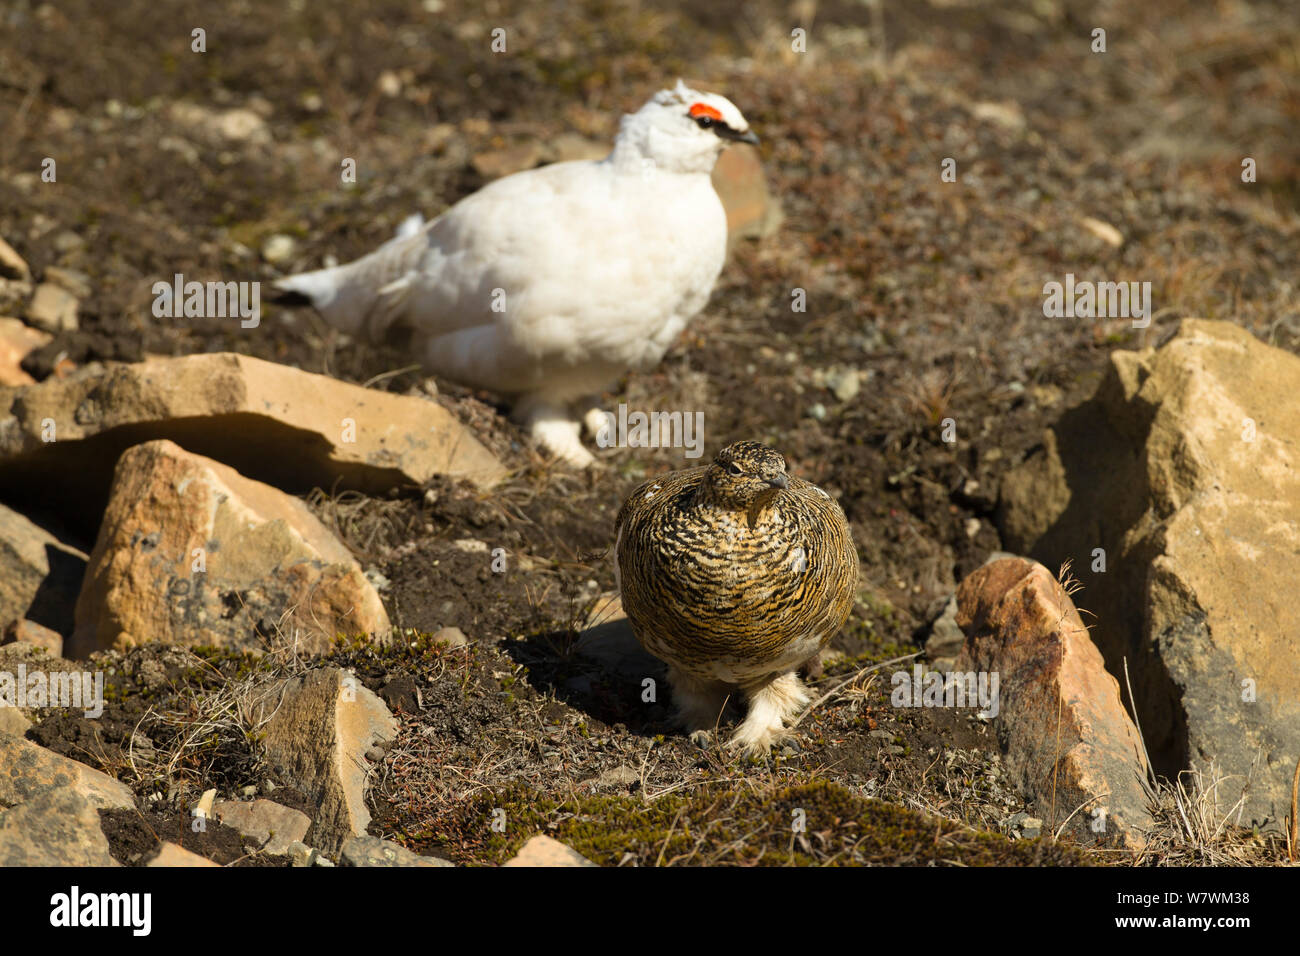 Rock ptarmigan (Lagopus muta) female in summer plumage and male in winter plumage, Longyearbyen, Spitsbergen, Svalbard, Norway. June. Stock Photo